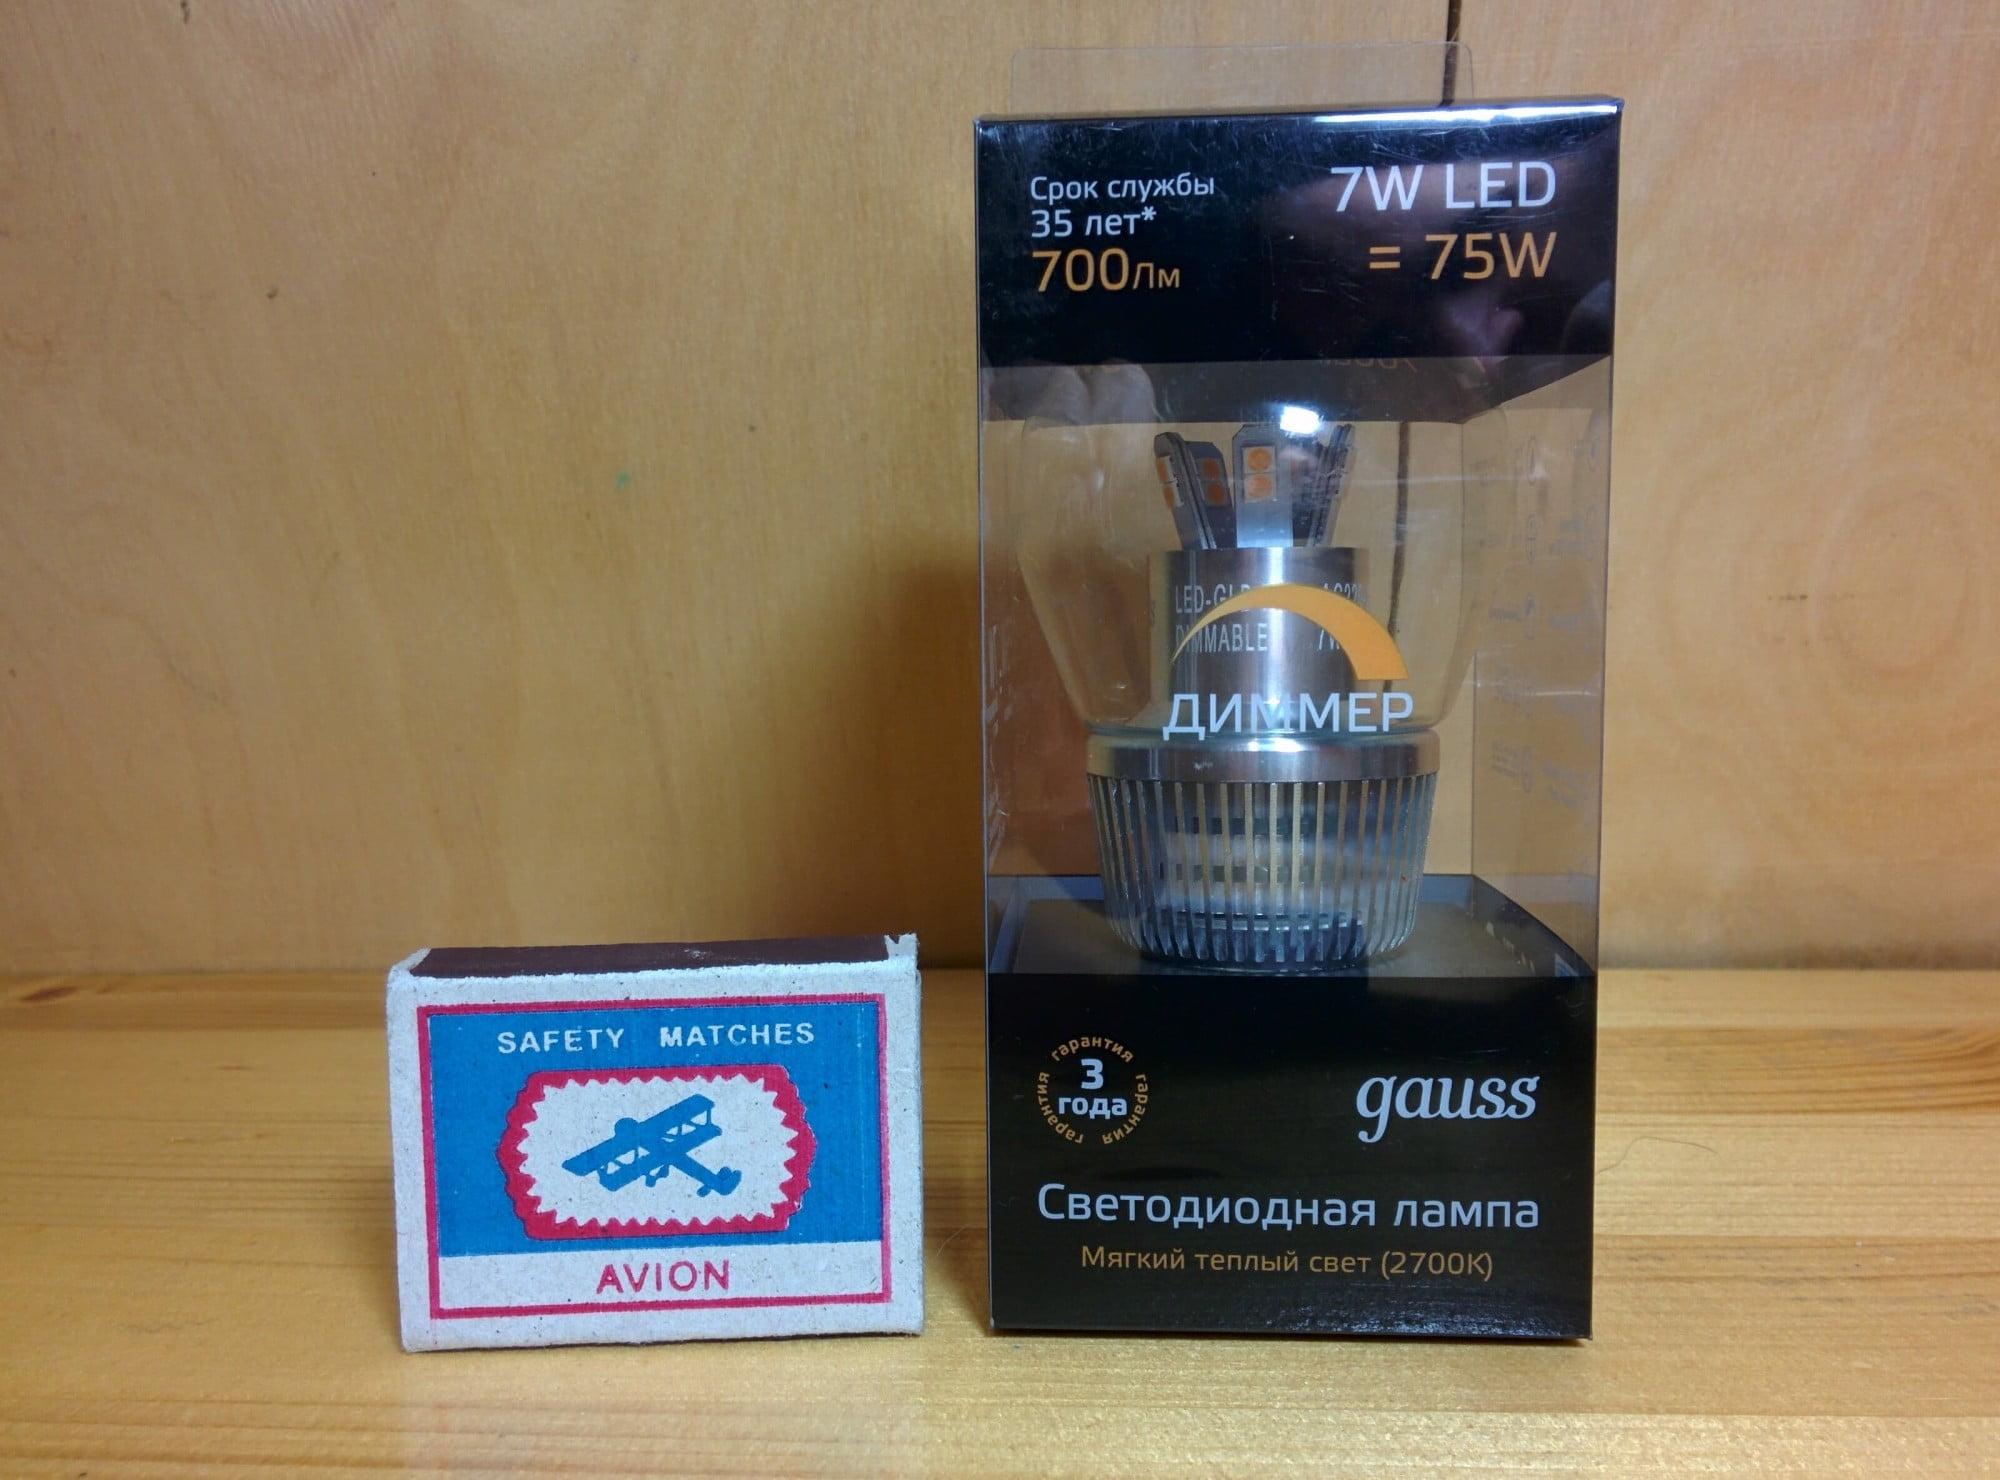 Gauss LED Globe-dim Crystal Clear 7W E27 2700K диммируемая упаковка